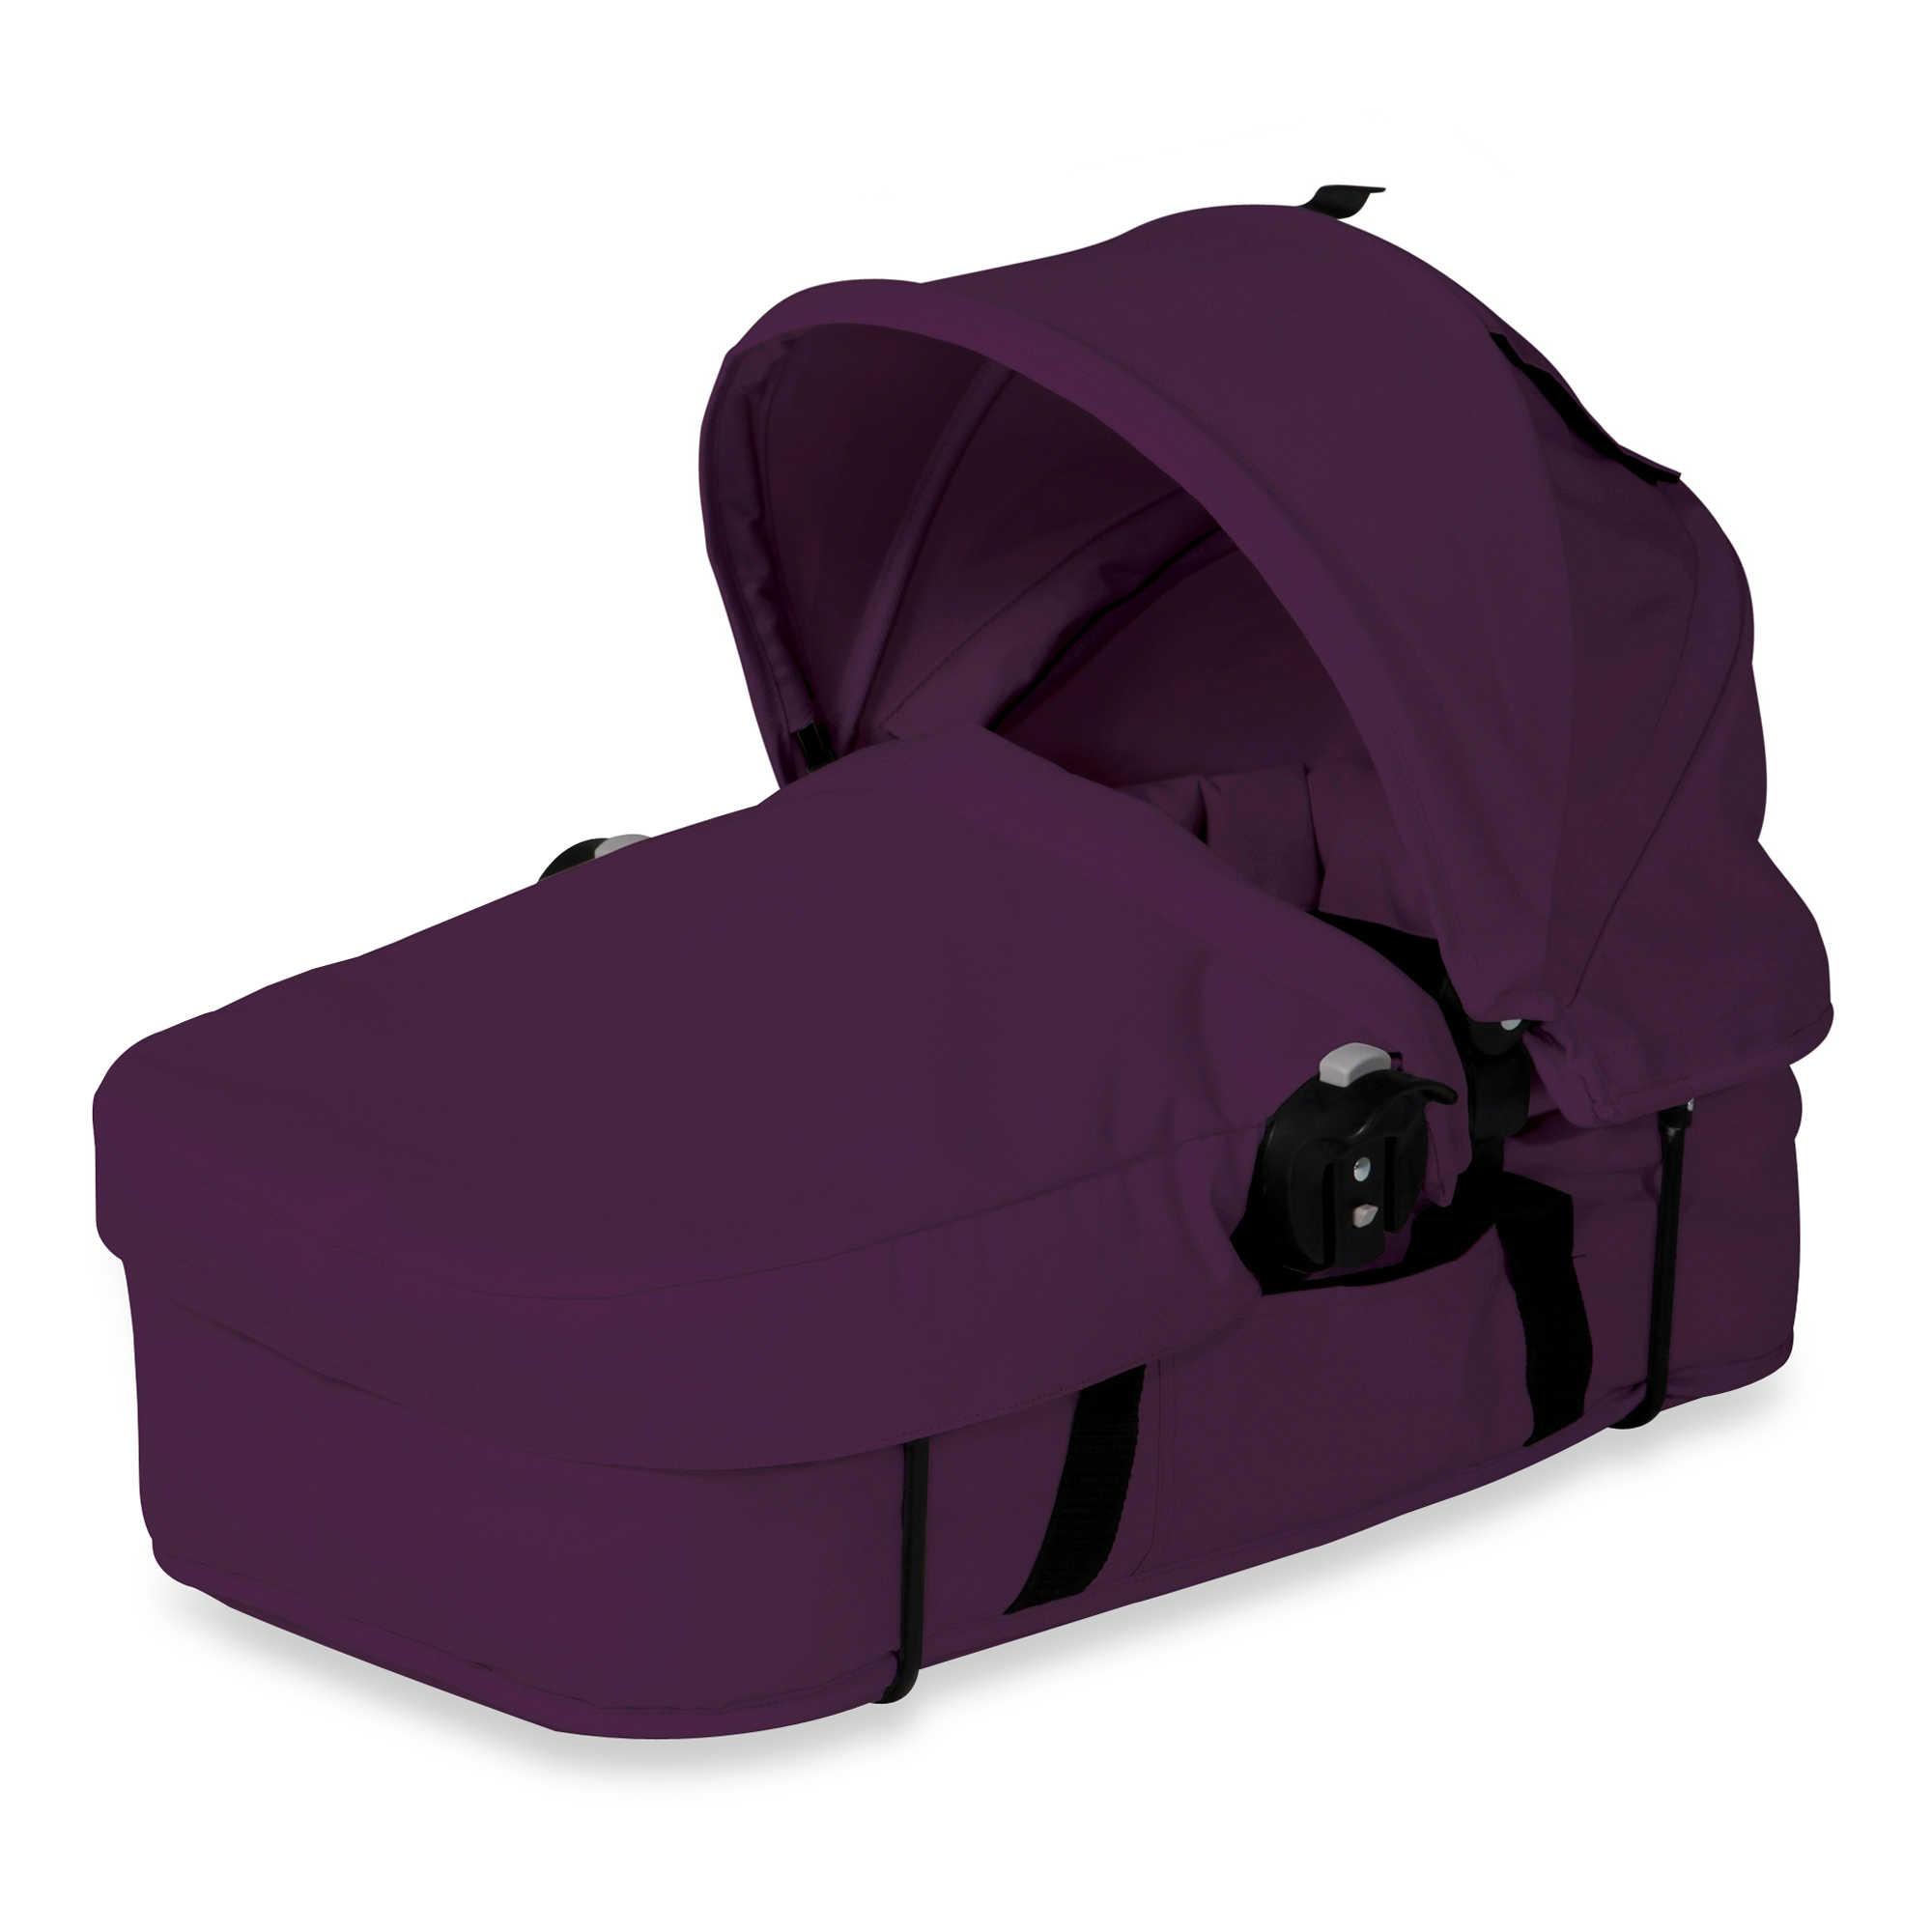 bassinet for baby jogger city mini baby jogger zip car seat adaptors at winstanleys pramworld. Black Bedroom Furniture Sets. Home Design Ideas